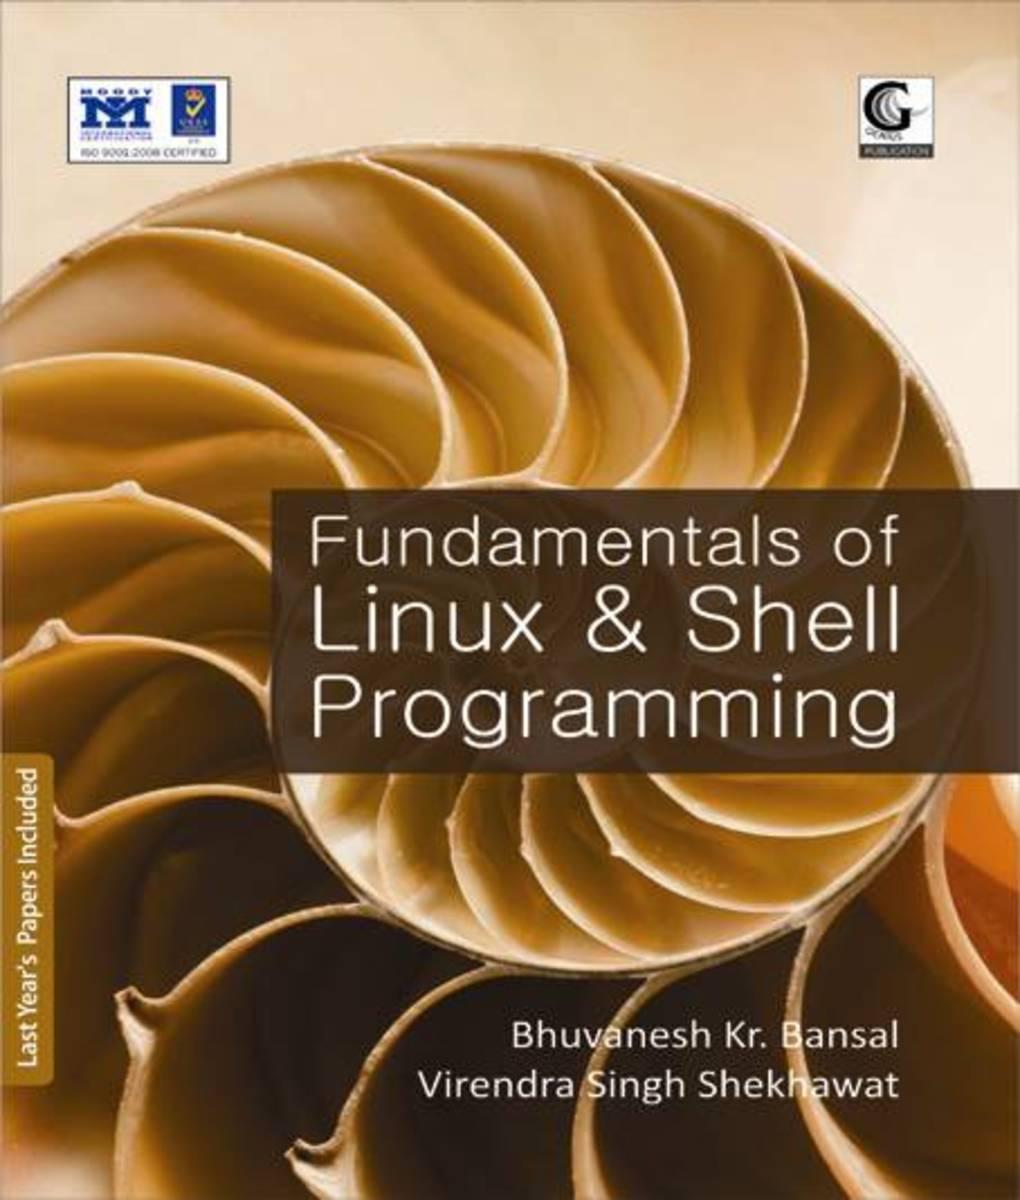 Fundamentals of Linux & Shell Programming